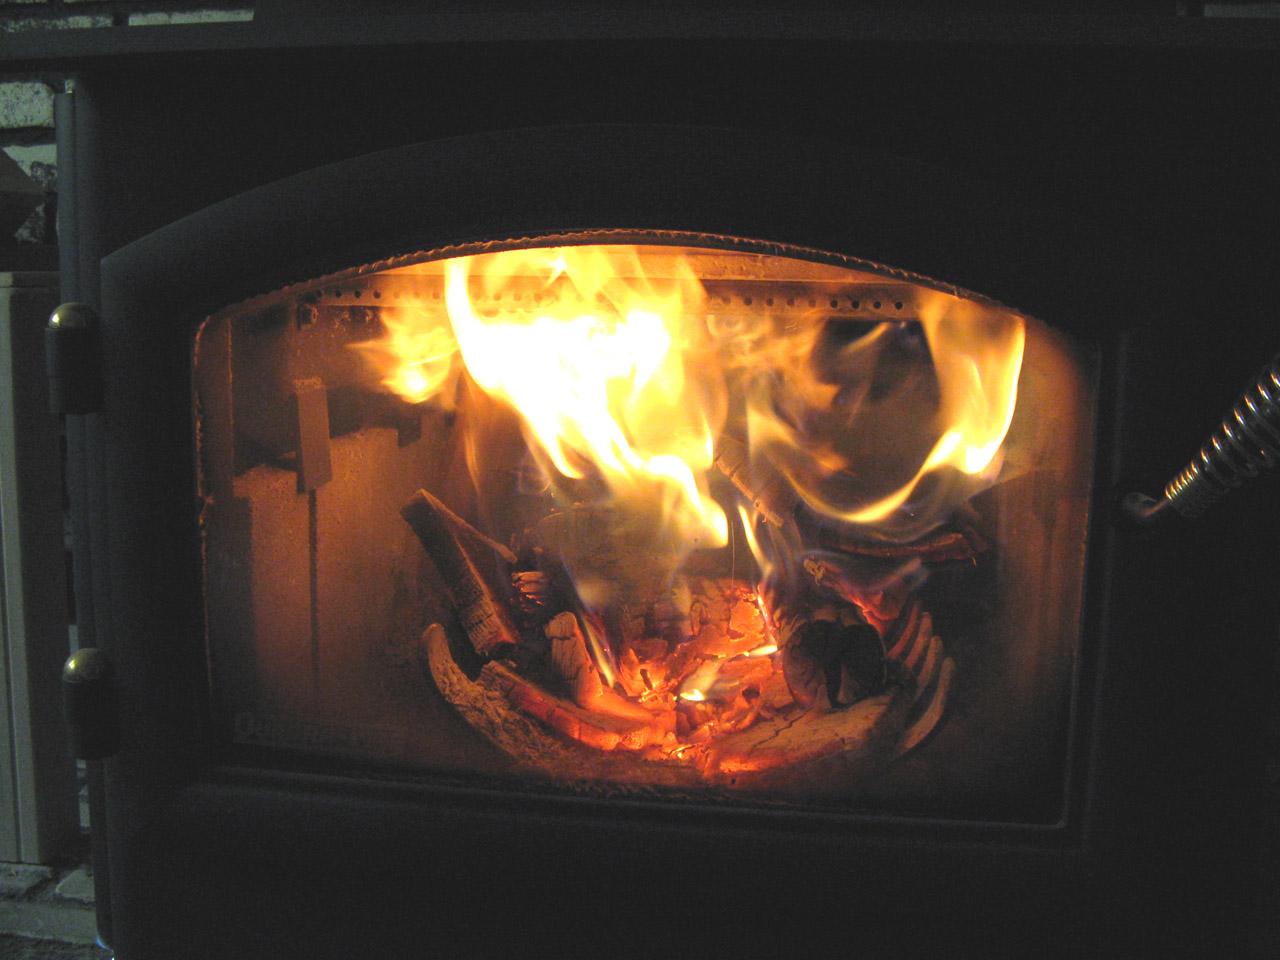 where there u0027s smoke michigan may battle epa over wood stove rules